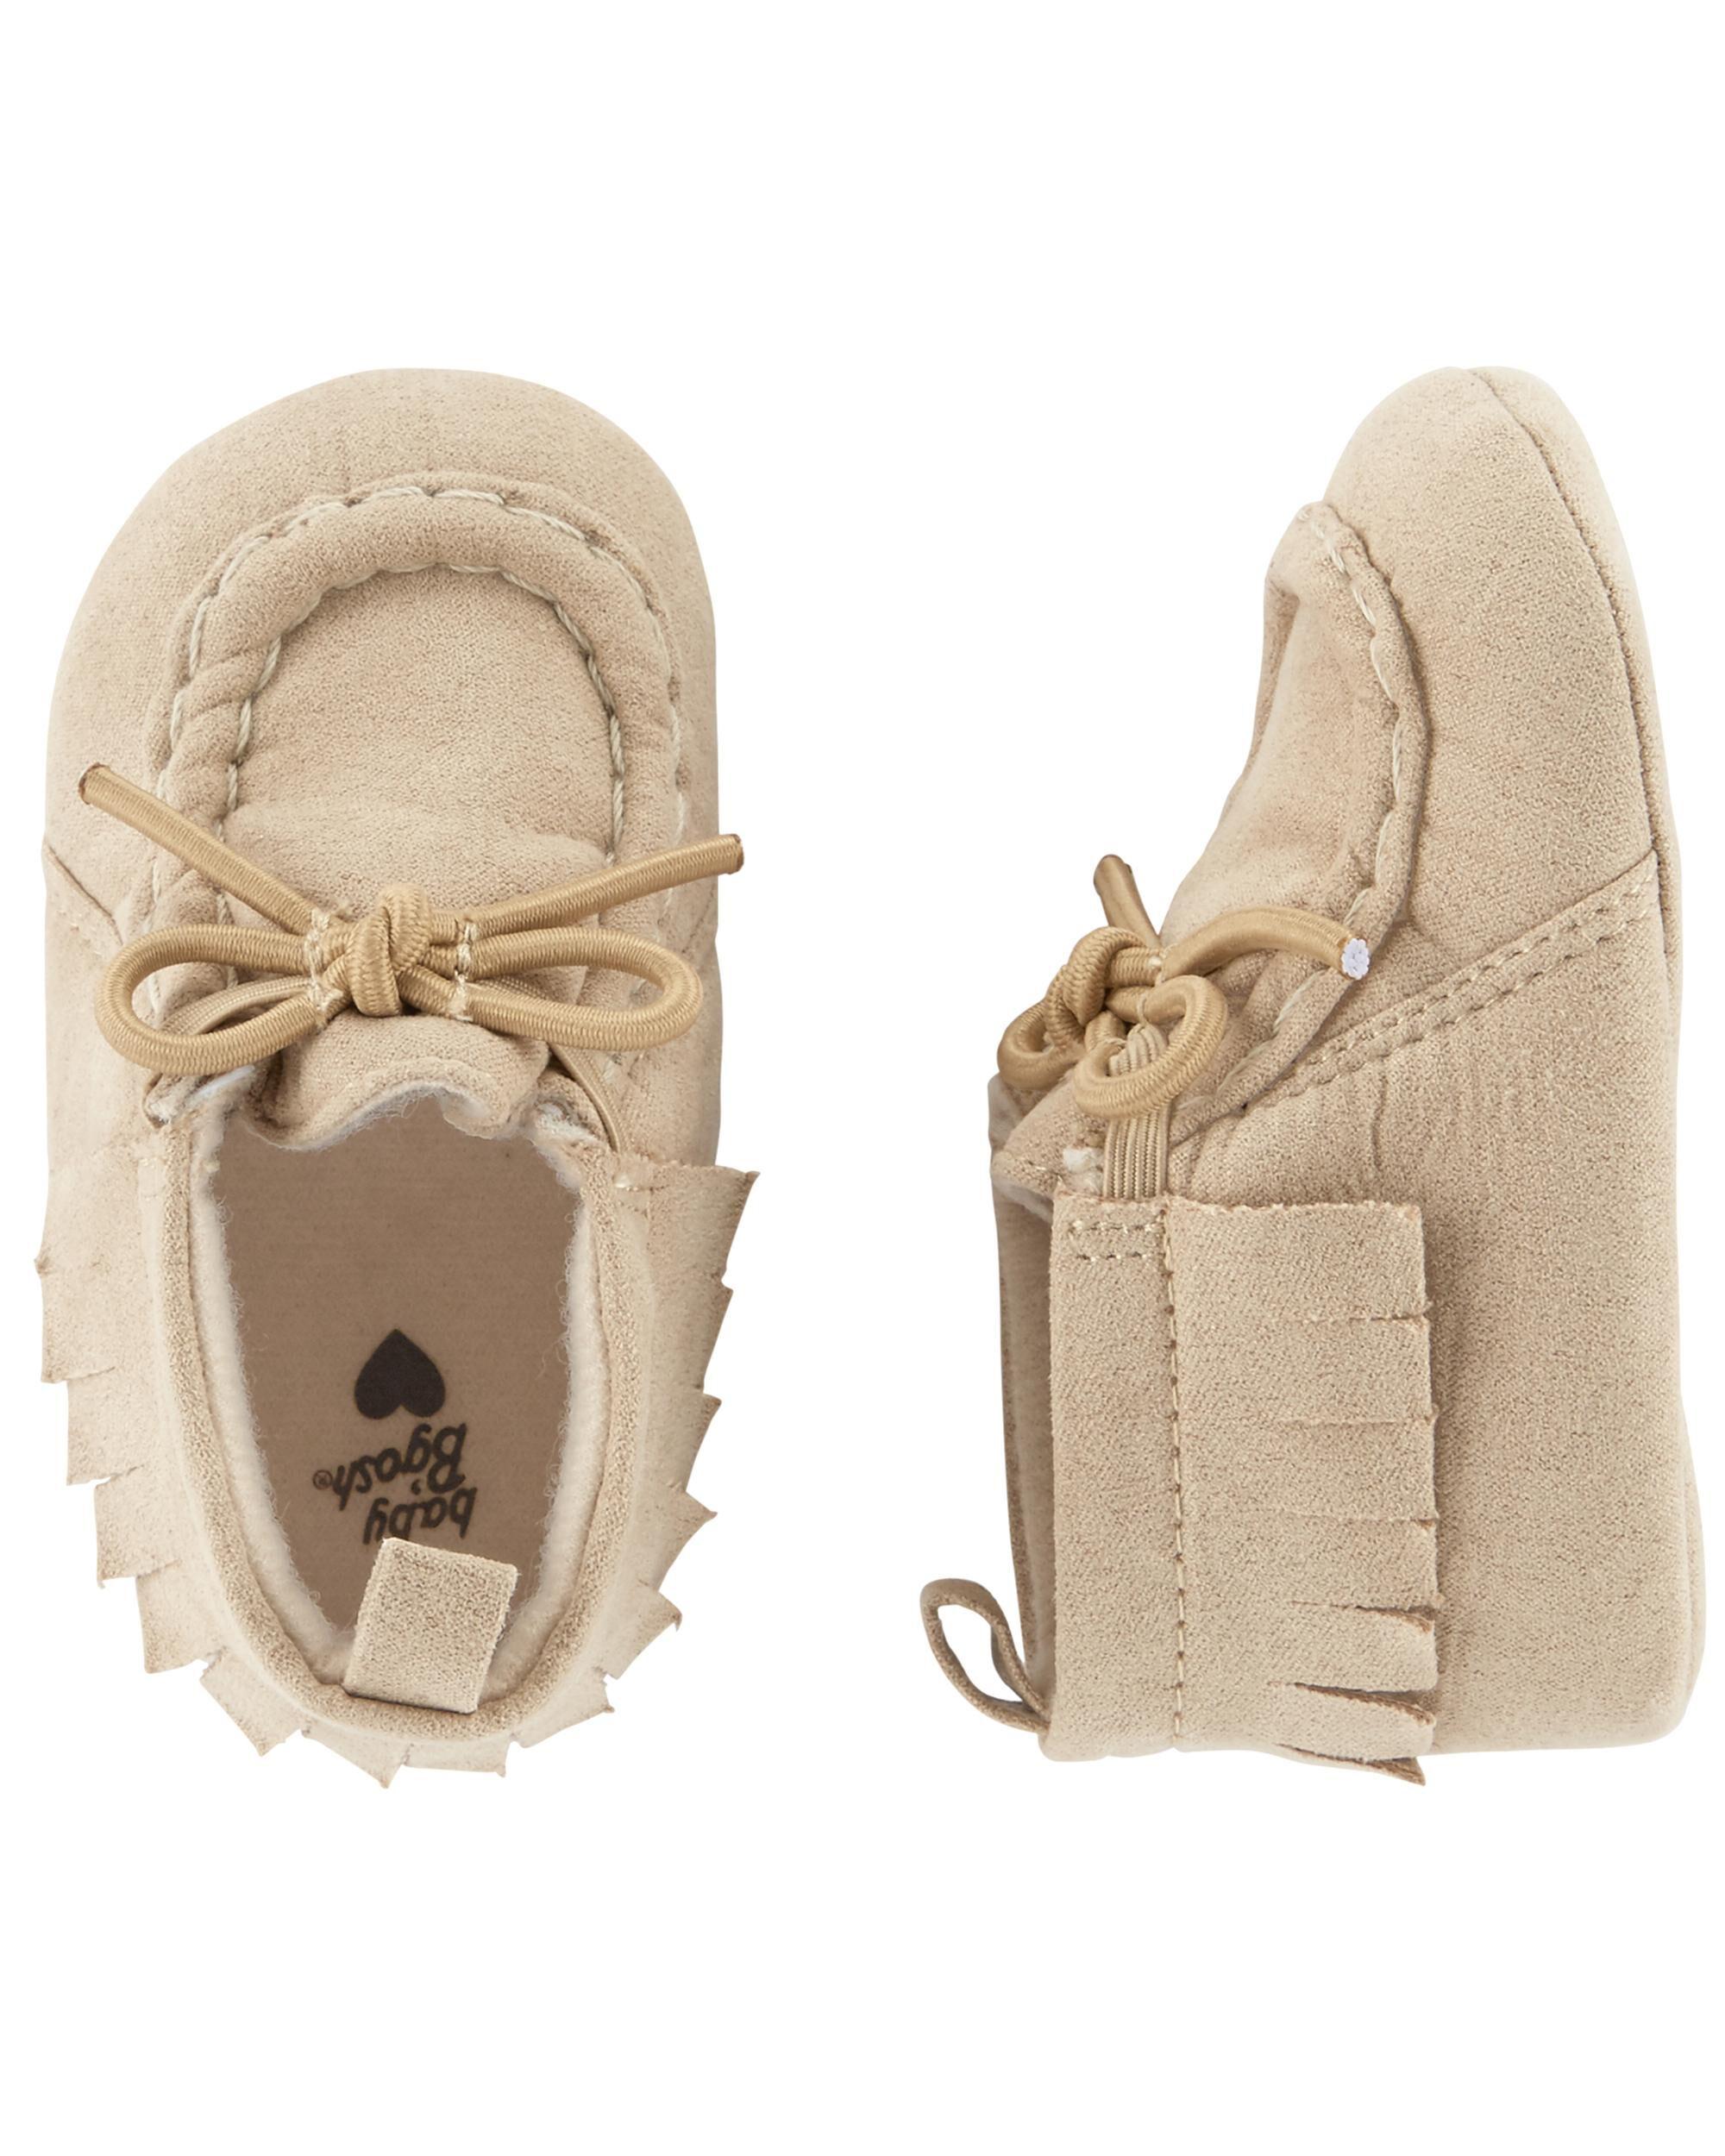 OshKosh Moccasin Crib Shoes | carters.com